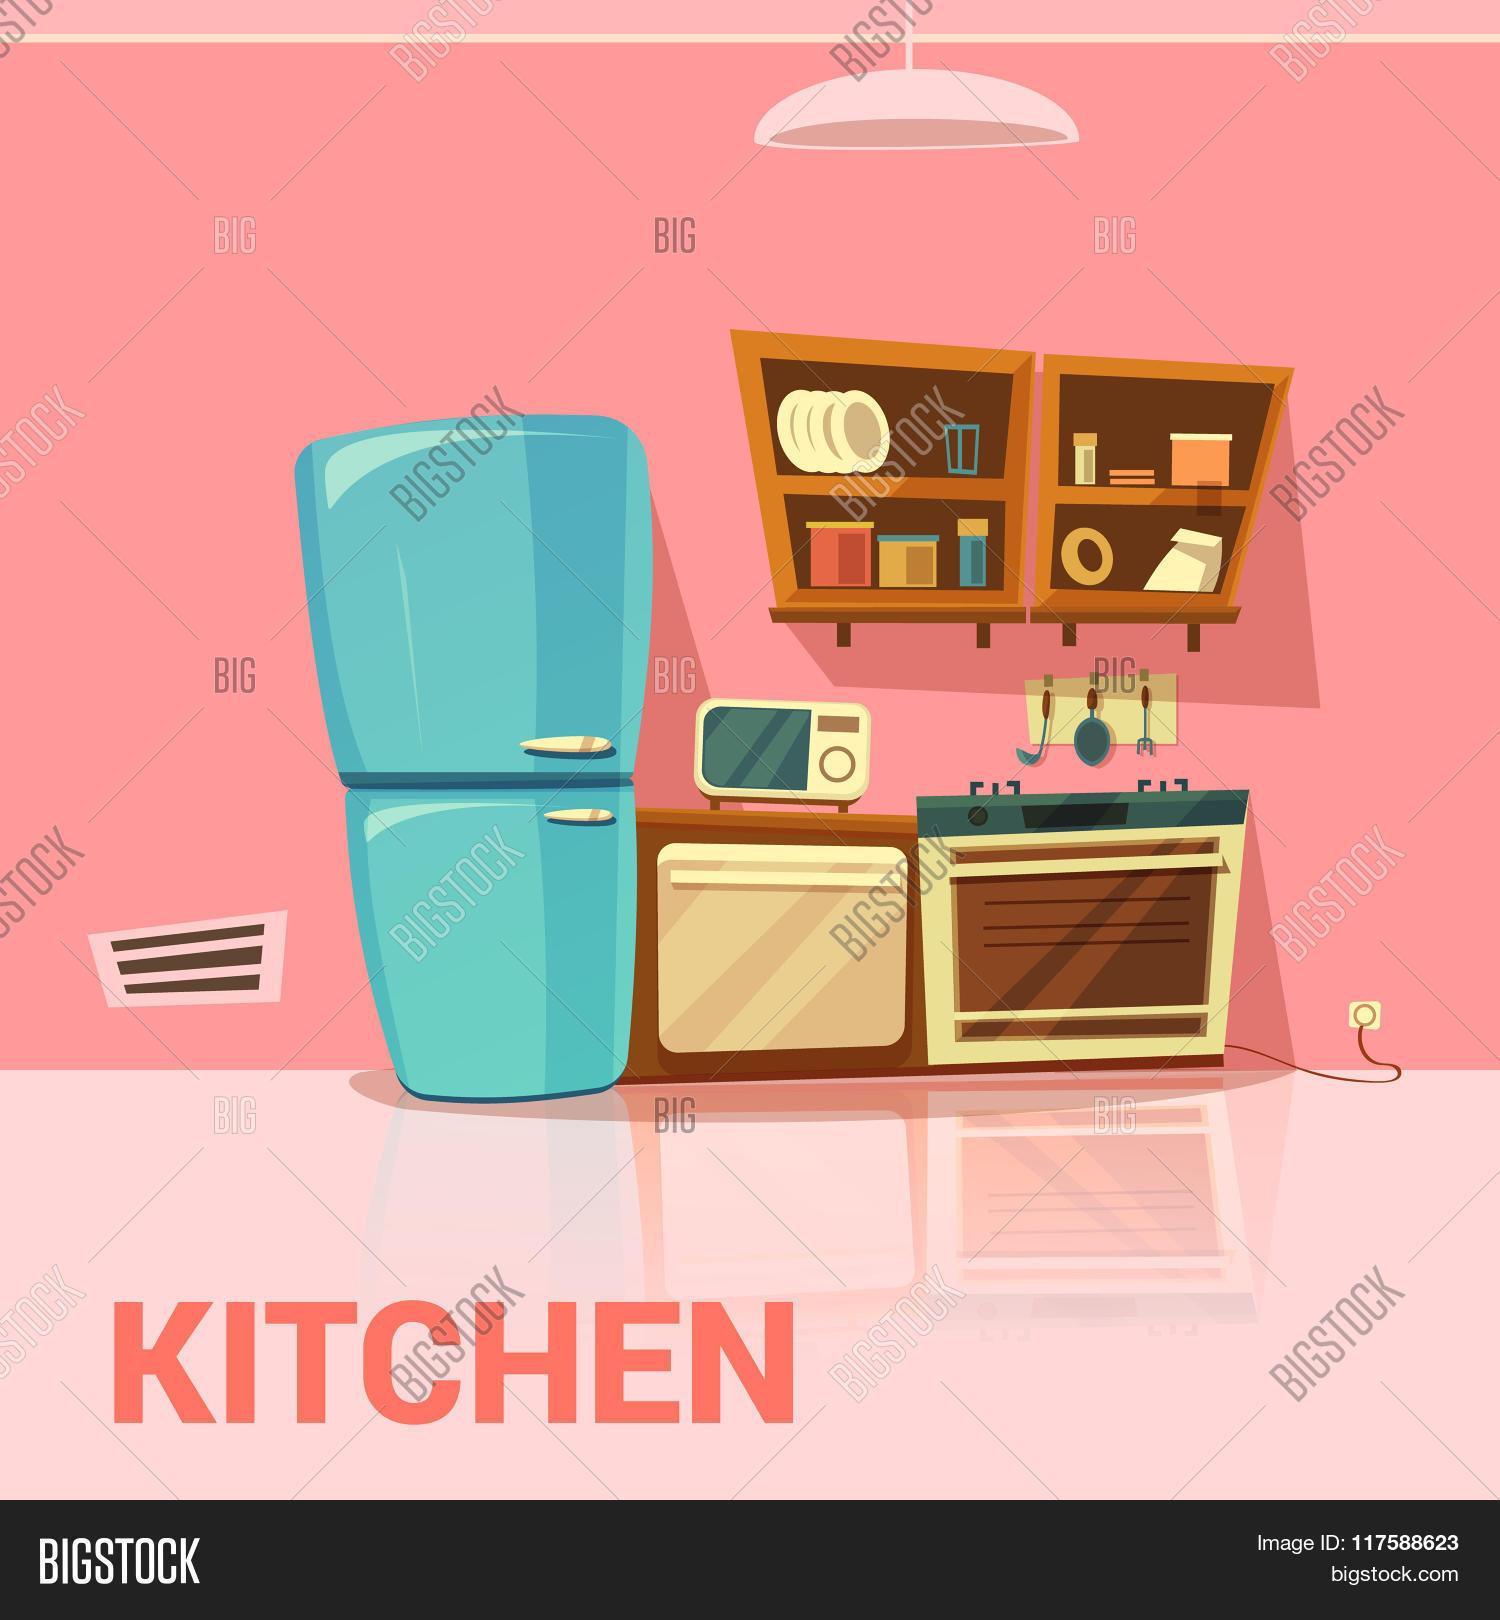 kitchen retro design vector photo bigstock. Black Bedroom Furniture Sets. Home Design Ideas